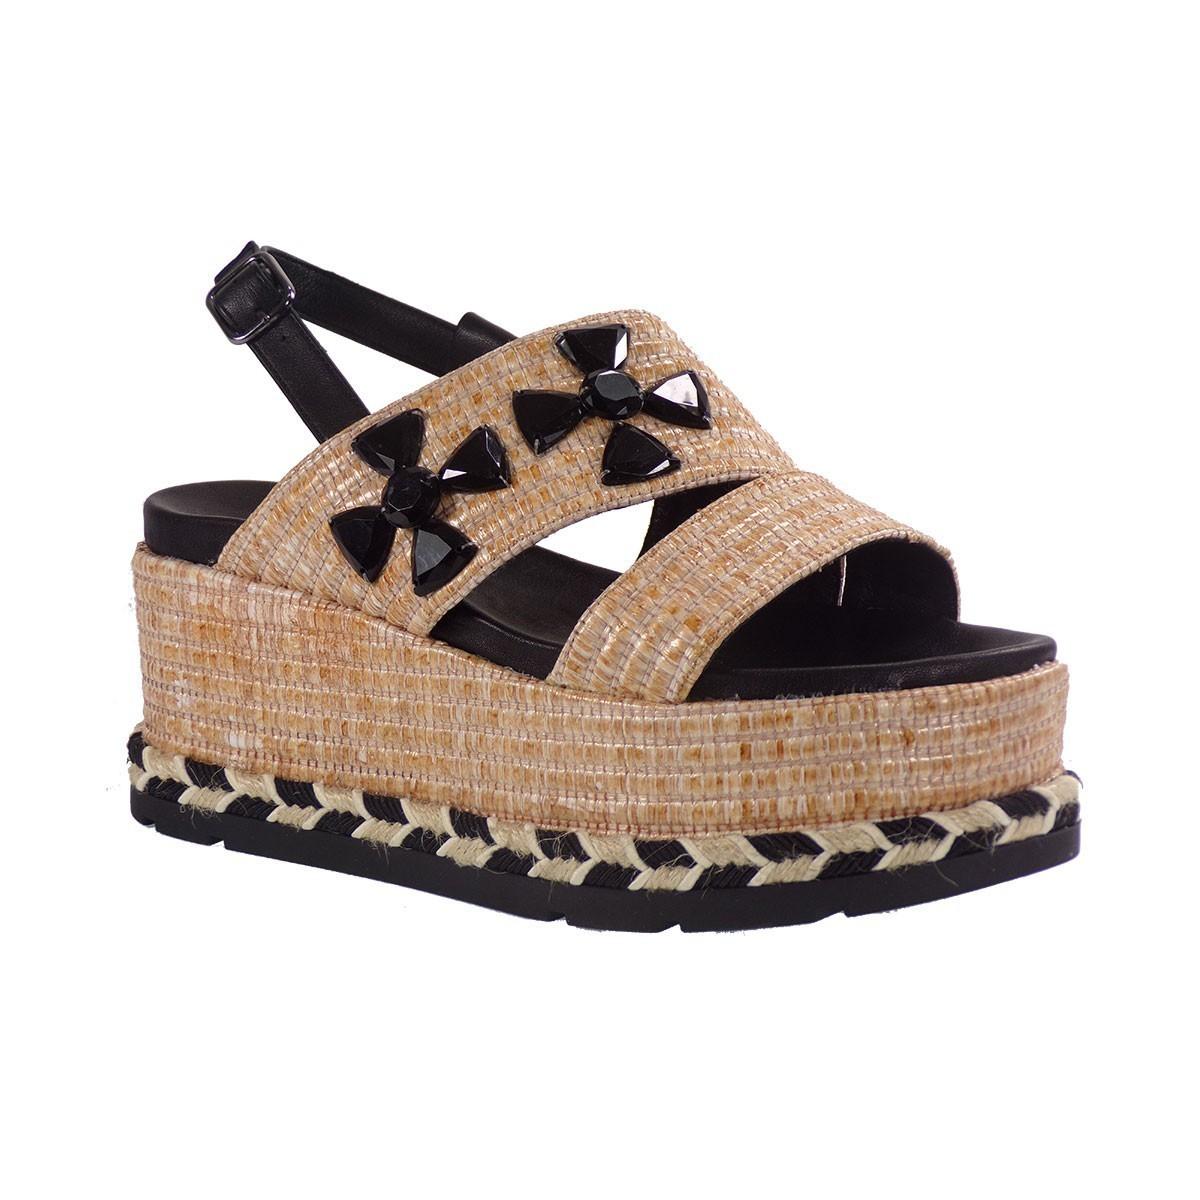 EXE Shoes Γυναικεία Πέδιλα Πλατφόρμες SINEA-704 Nude-Μαύρο G4700704